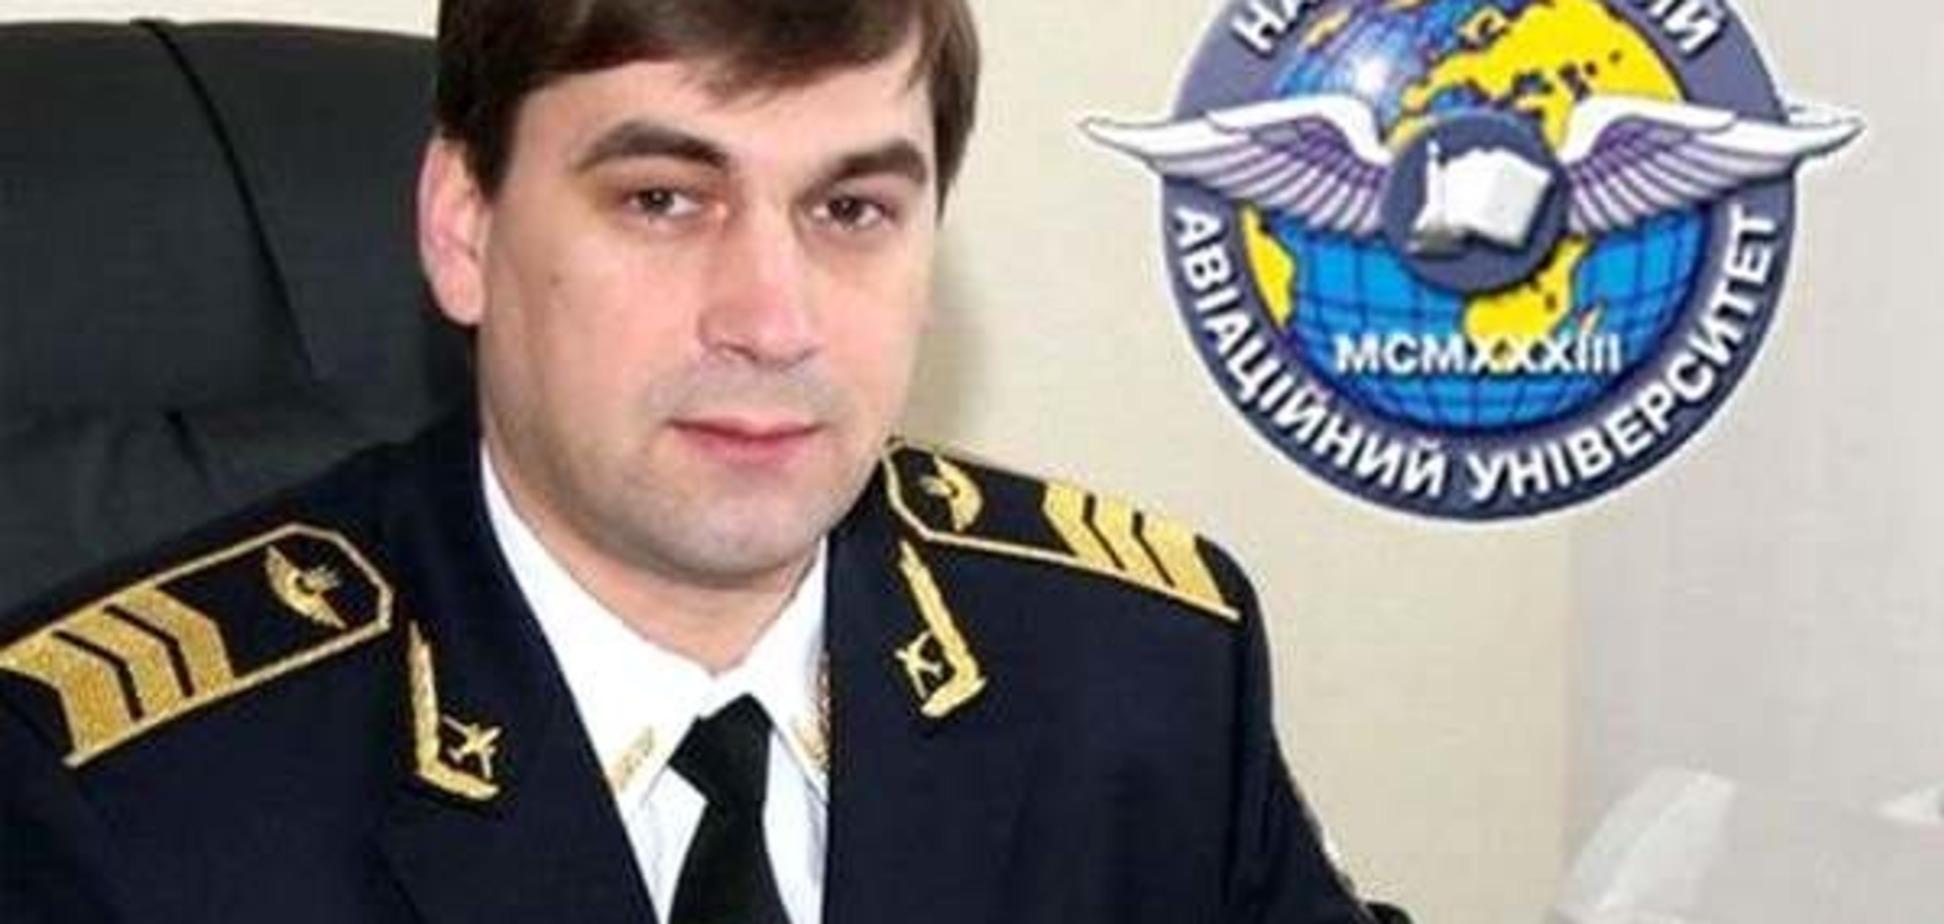 Кума Табачника звільнили з НАУ: почався скандал